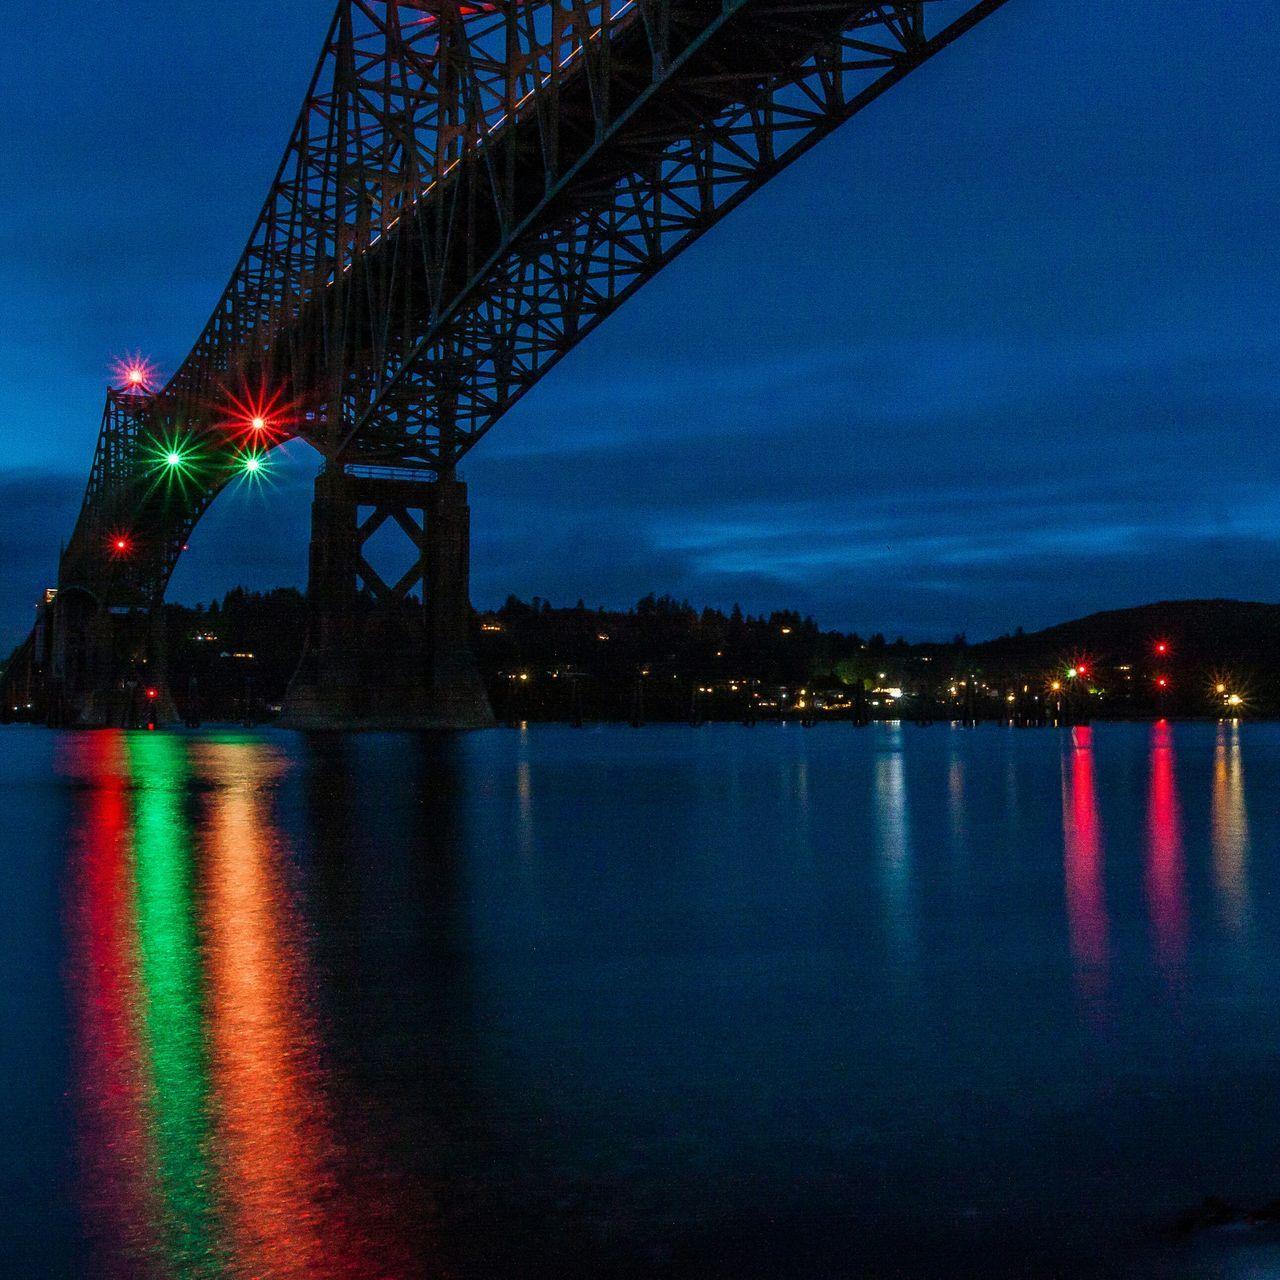 Photography Taking Photos DSLR Photography Bayarea Outdoor Photography Under The Bridge Nightphotography North Bend Oregon Coast Jewell Photography Coos Bay Eveningtime